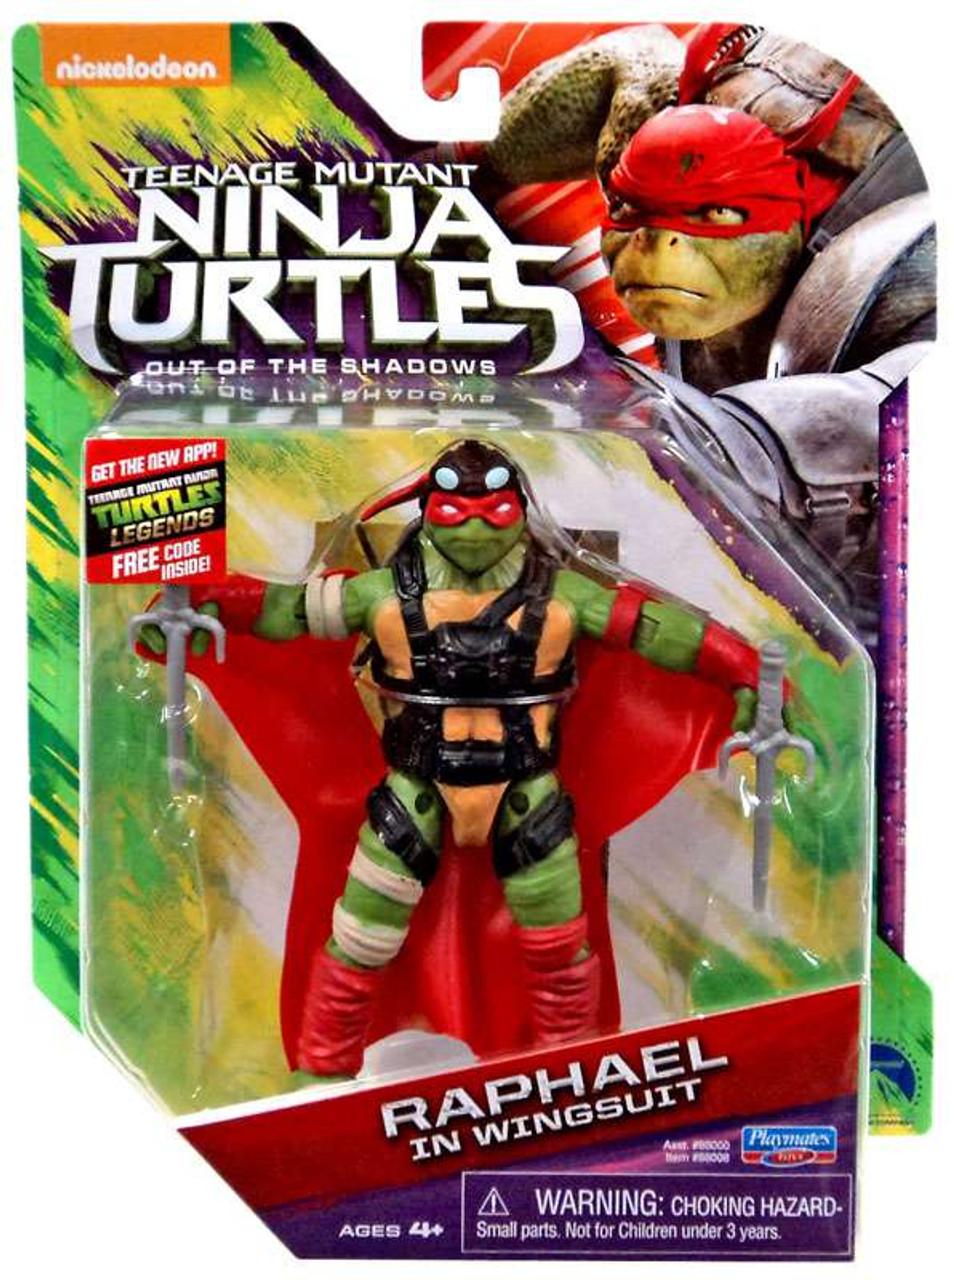 Teenage Mutant Ninja Turtles Out Of The Shadows Raphael In